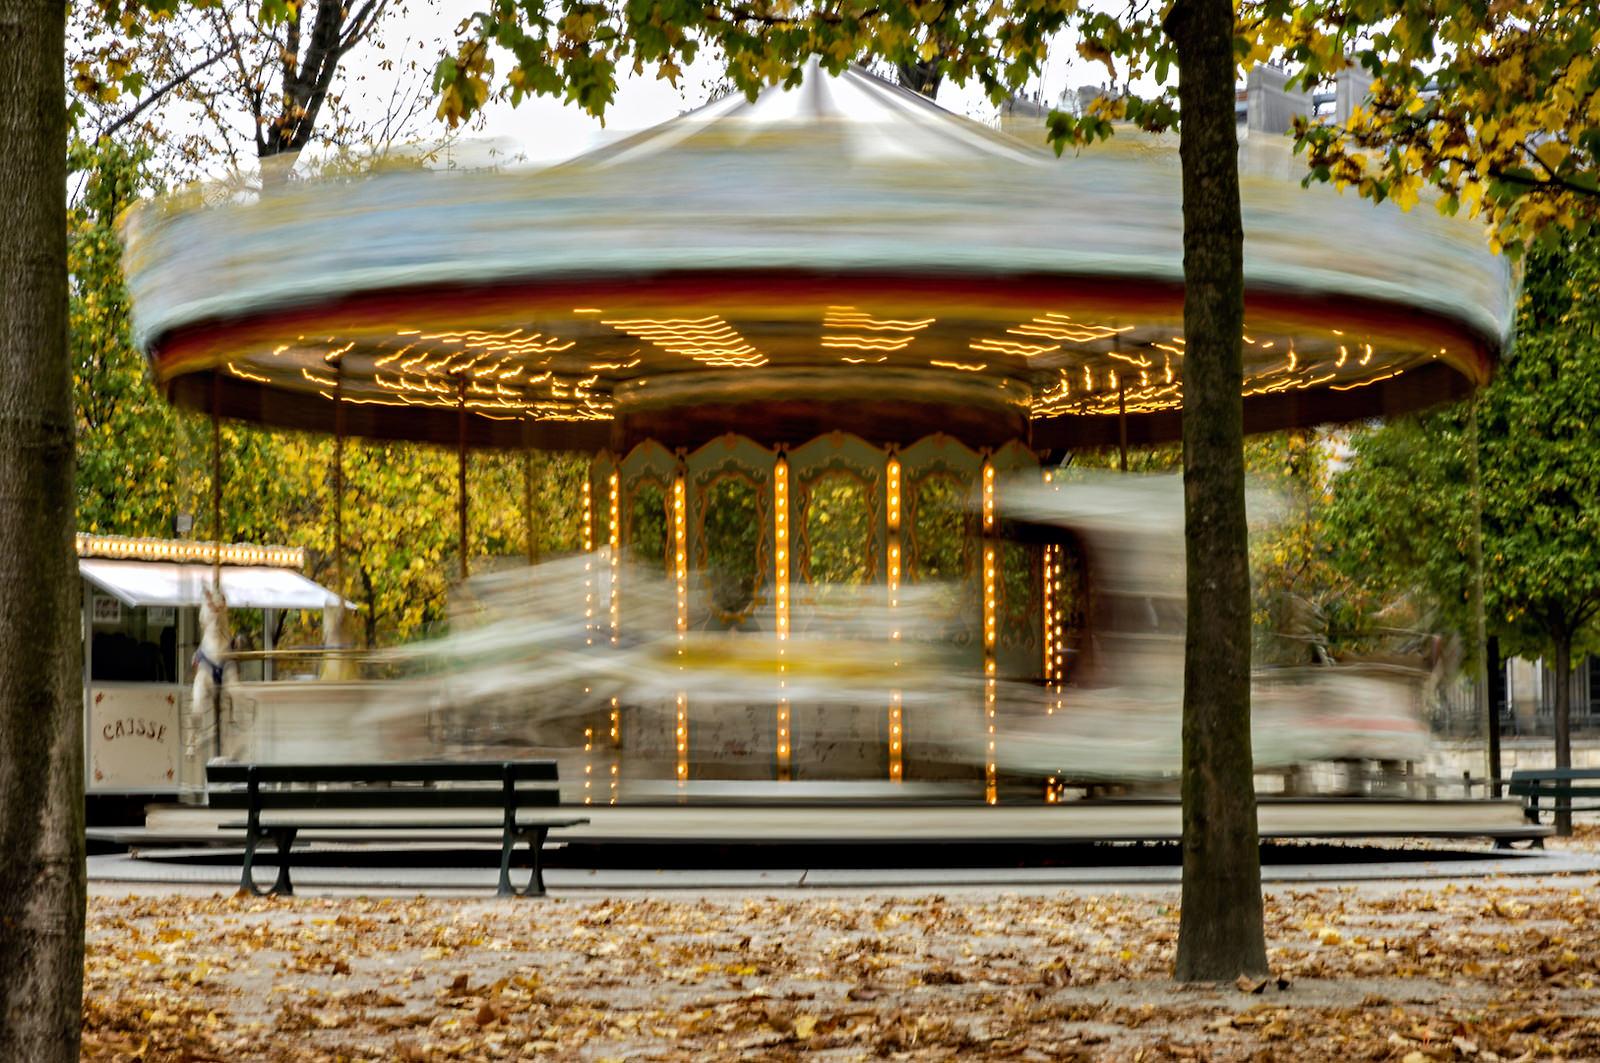 slow shutter carousel in paris